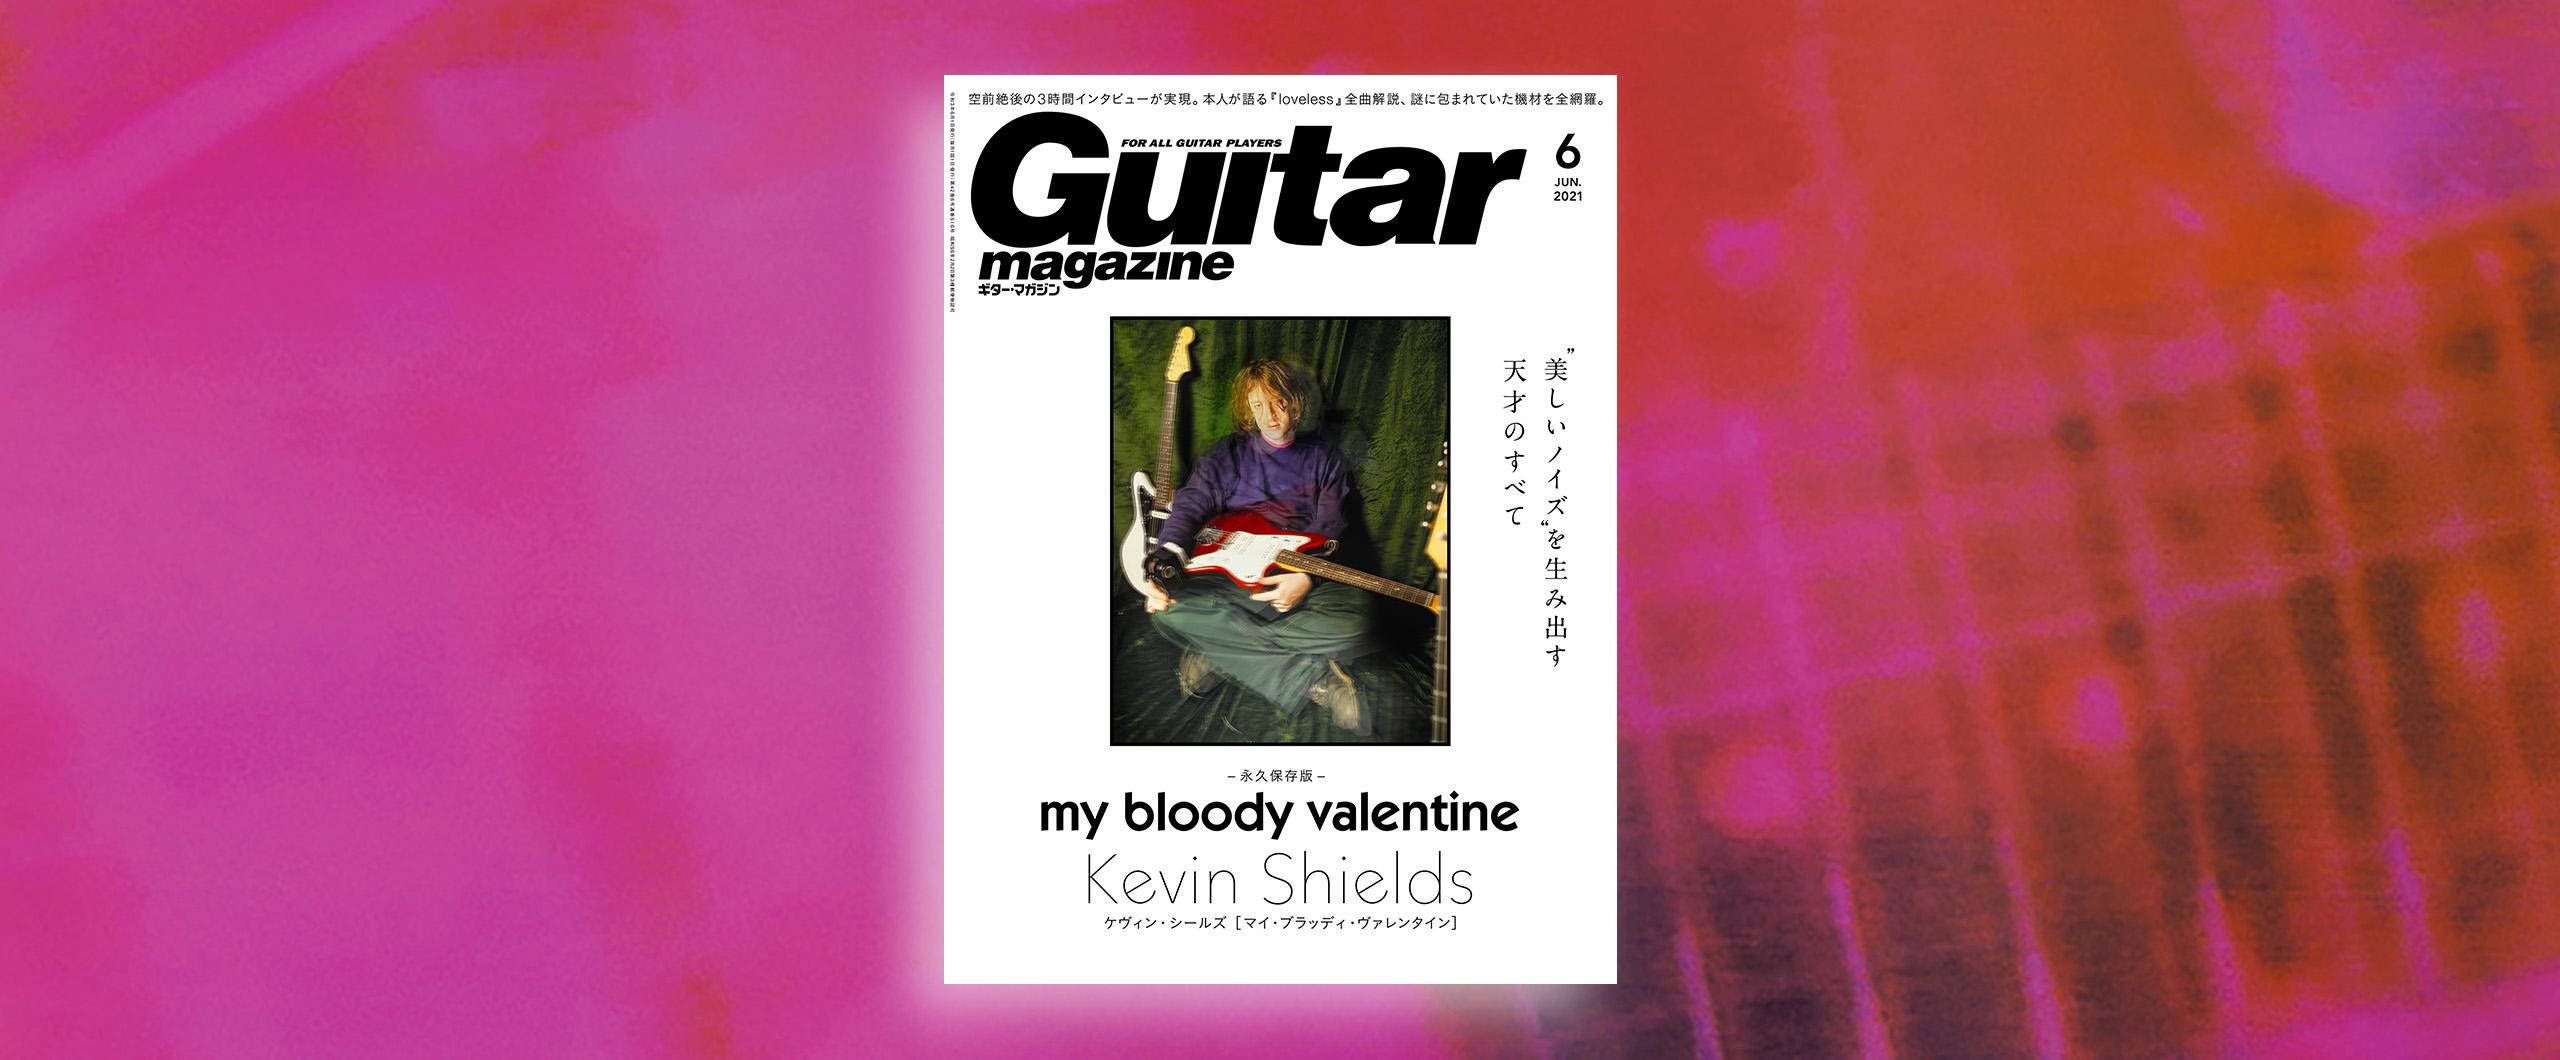 my bloody valentine,マイブラ,ギターマガジン,ギタマガ,ケヴィンシールズ,Death By Audio,デスバイオーディオ